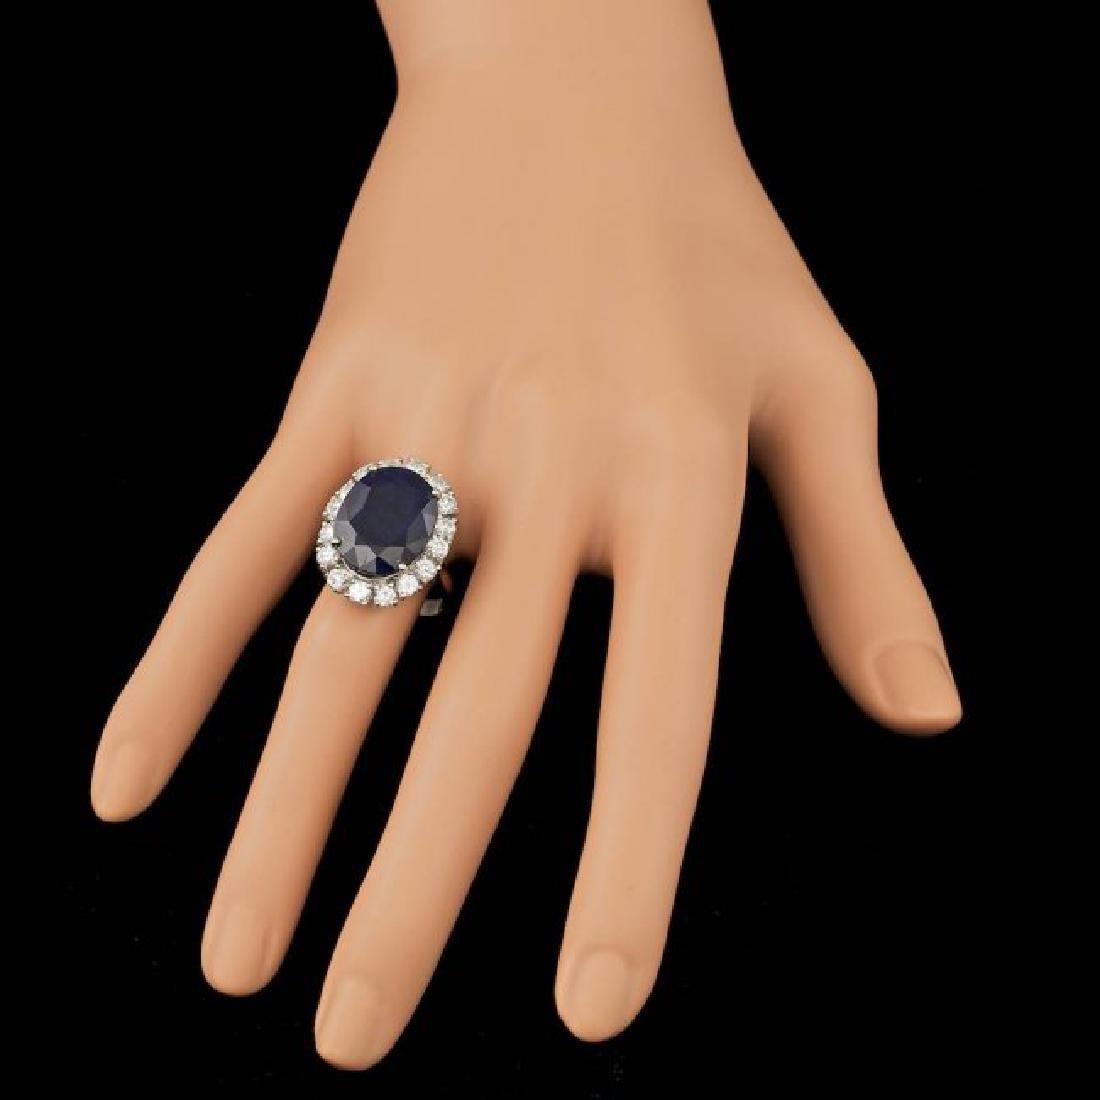 14k Gold 10.00ct Sapphire 1.90ct Diamond Ring - 4